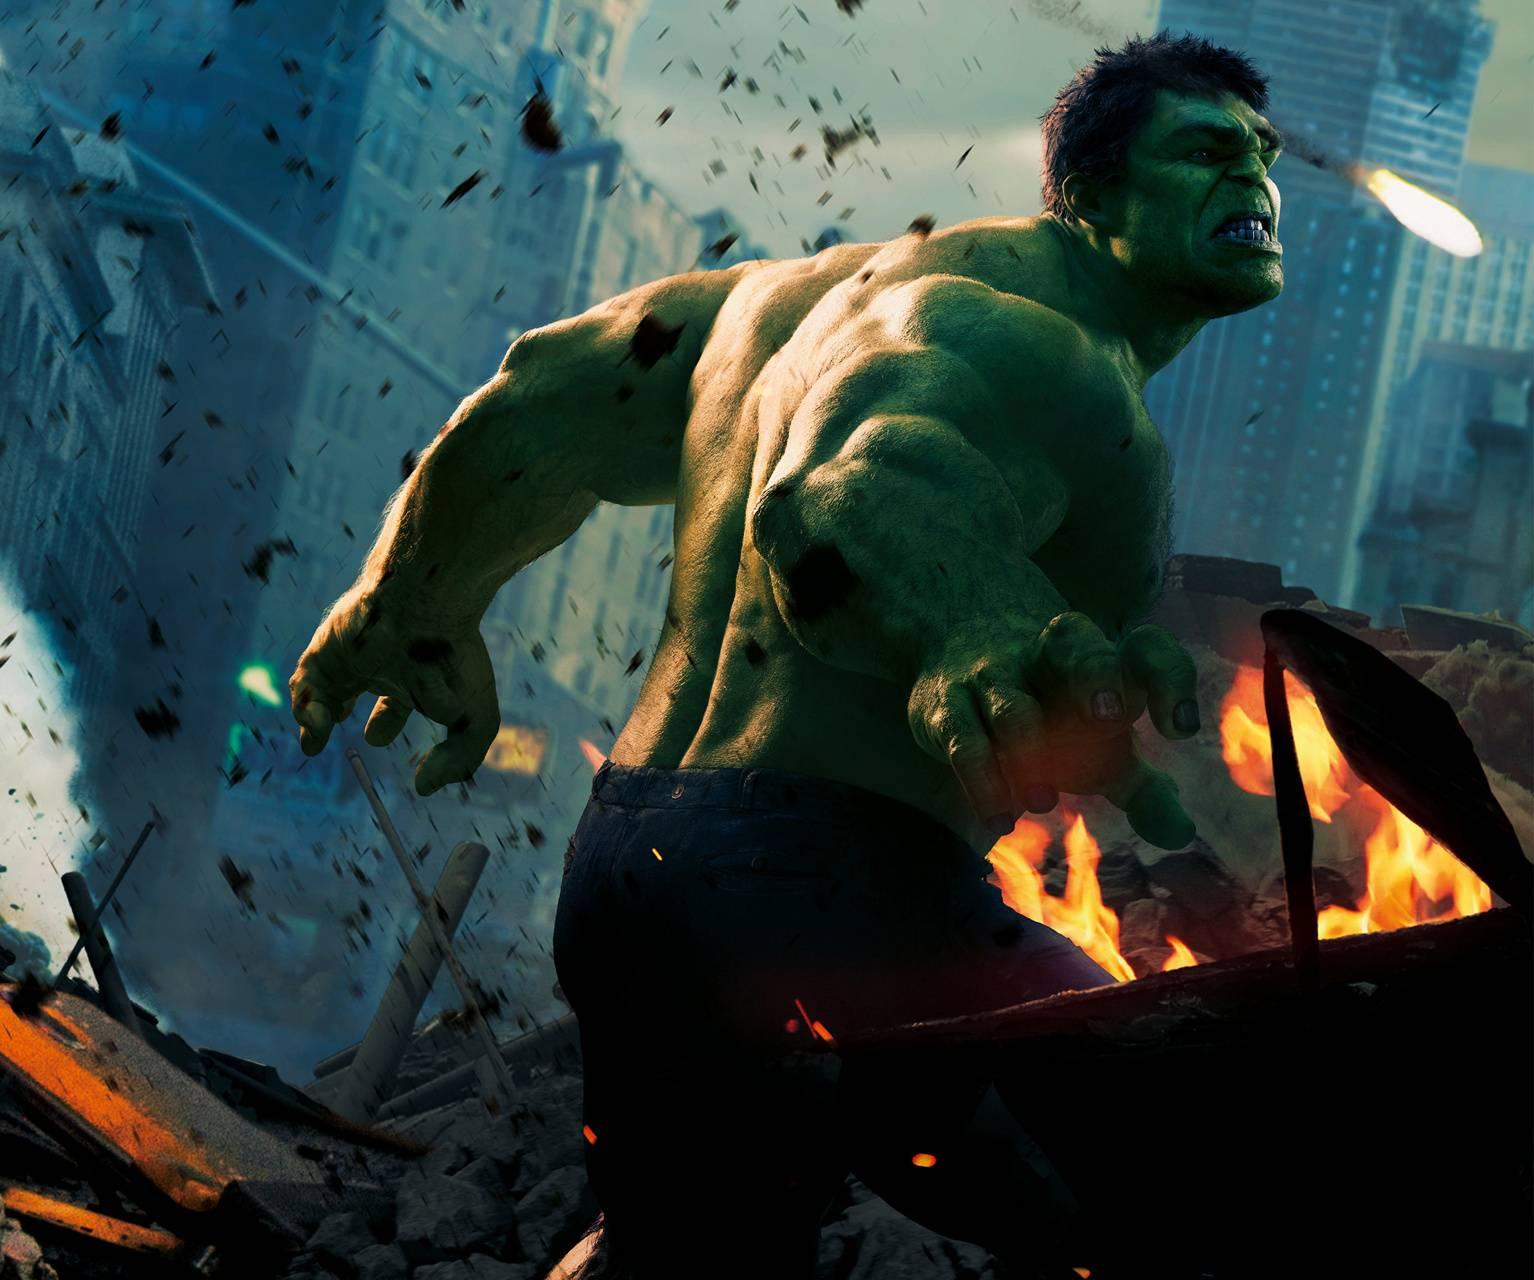 The Hulk Wallpaper